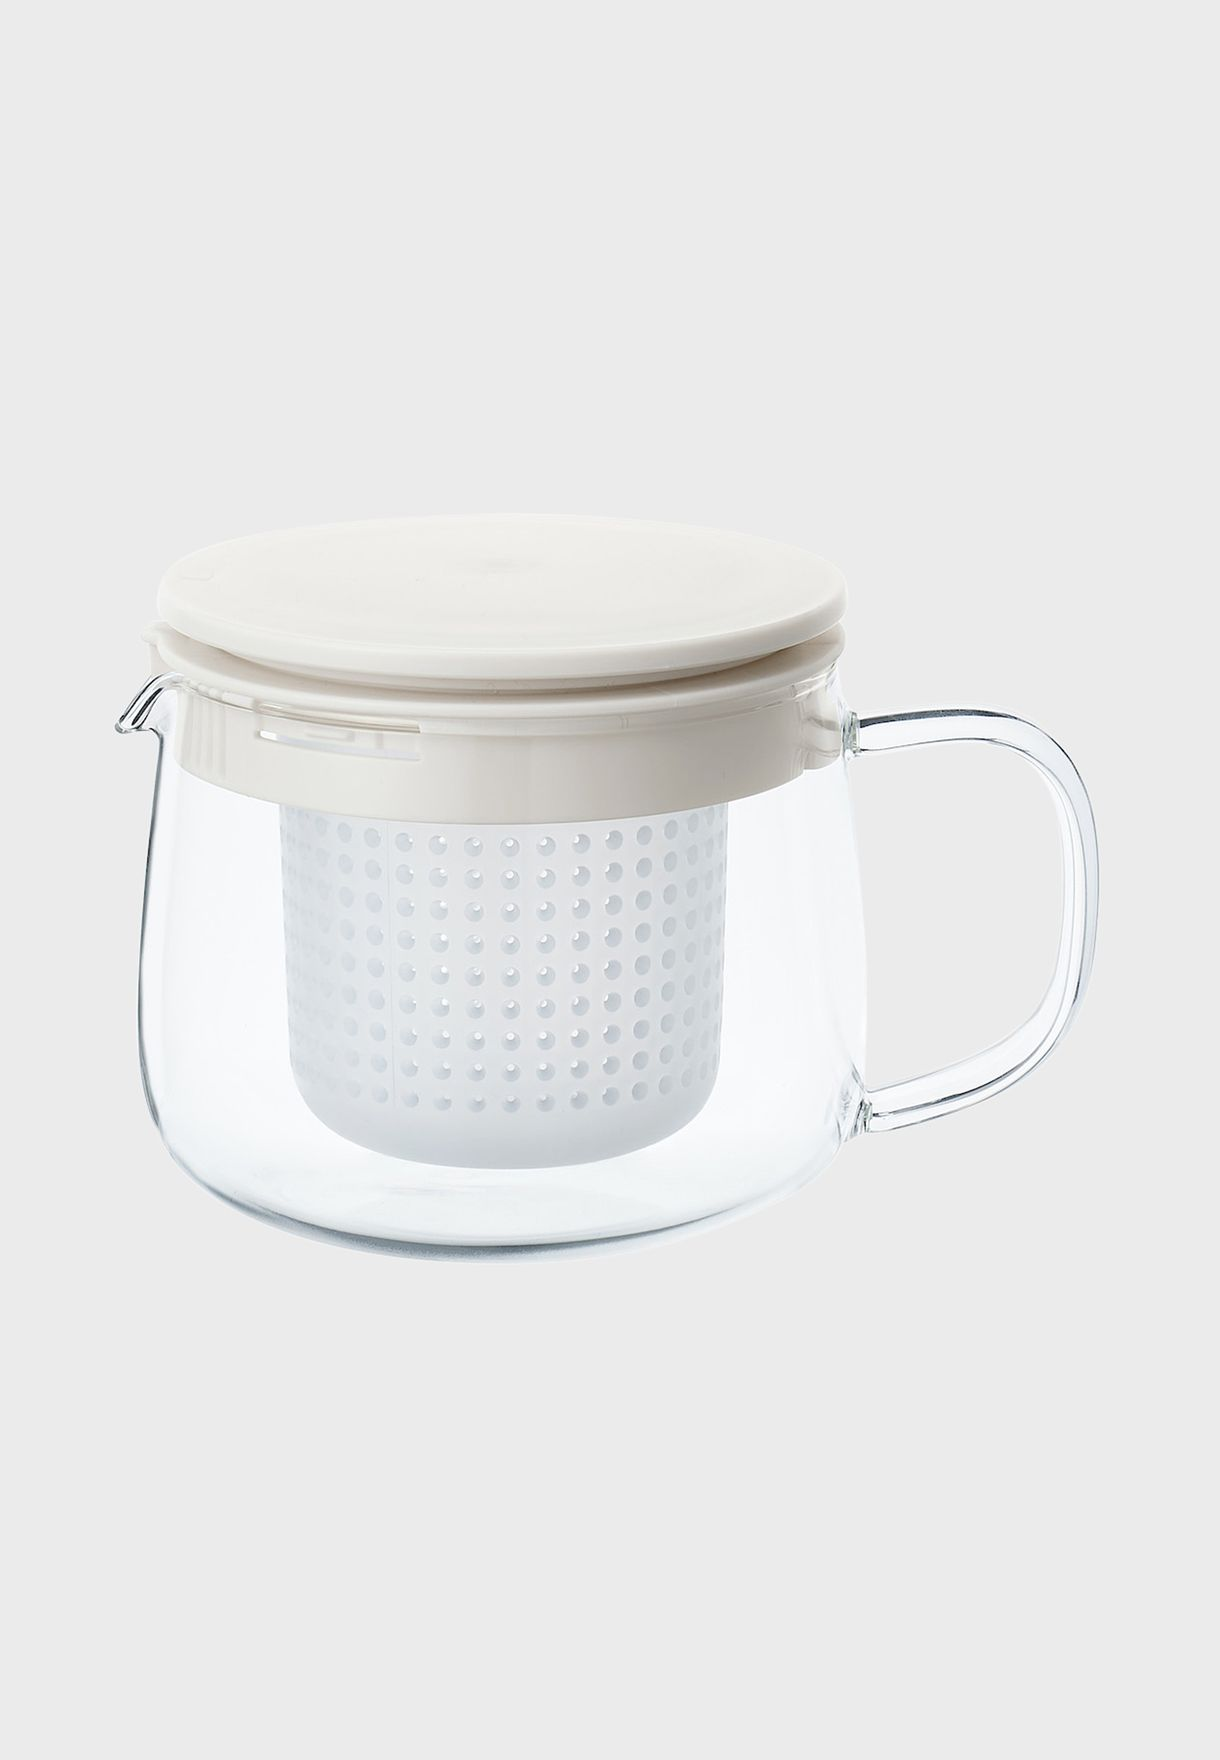 Small Heat Proof Glass Pot